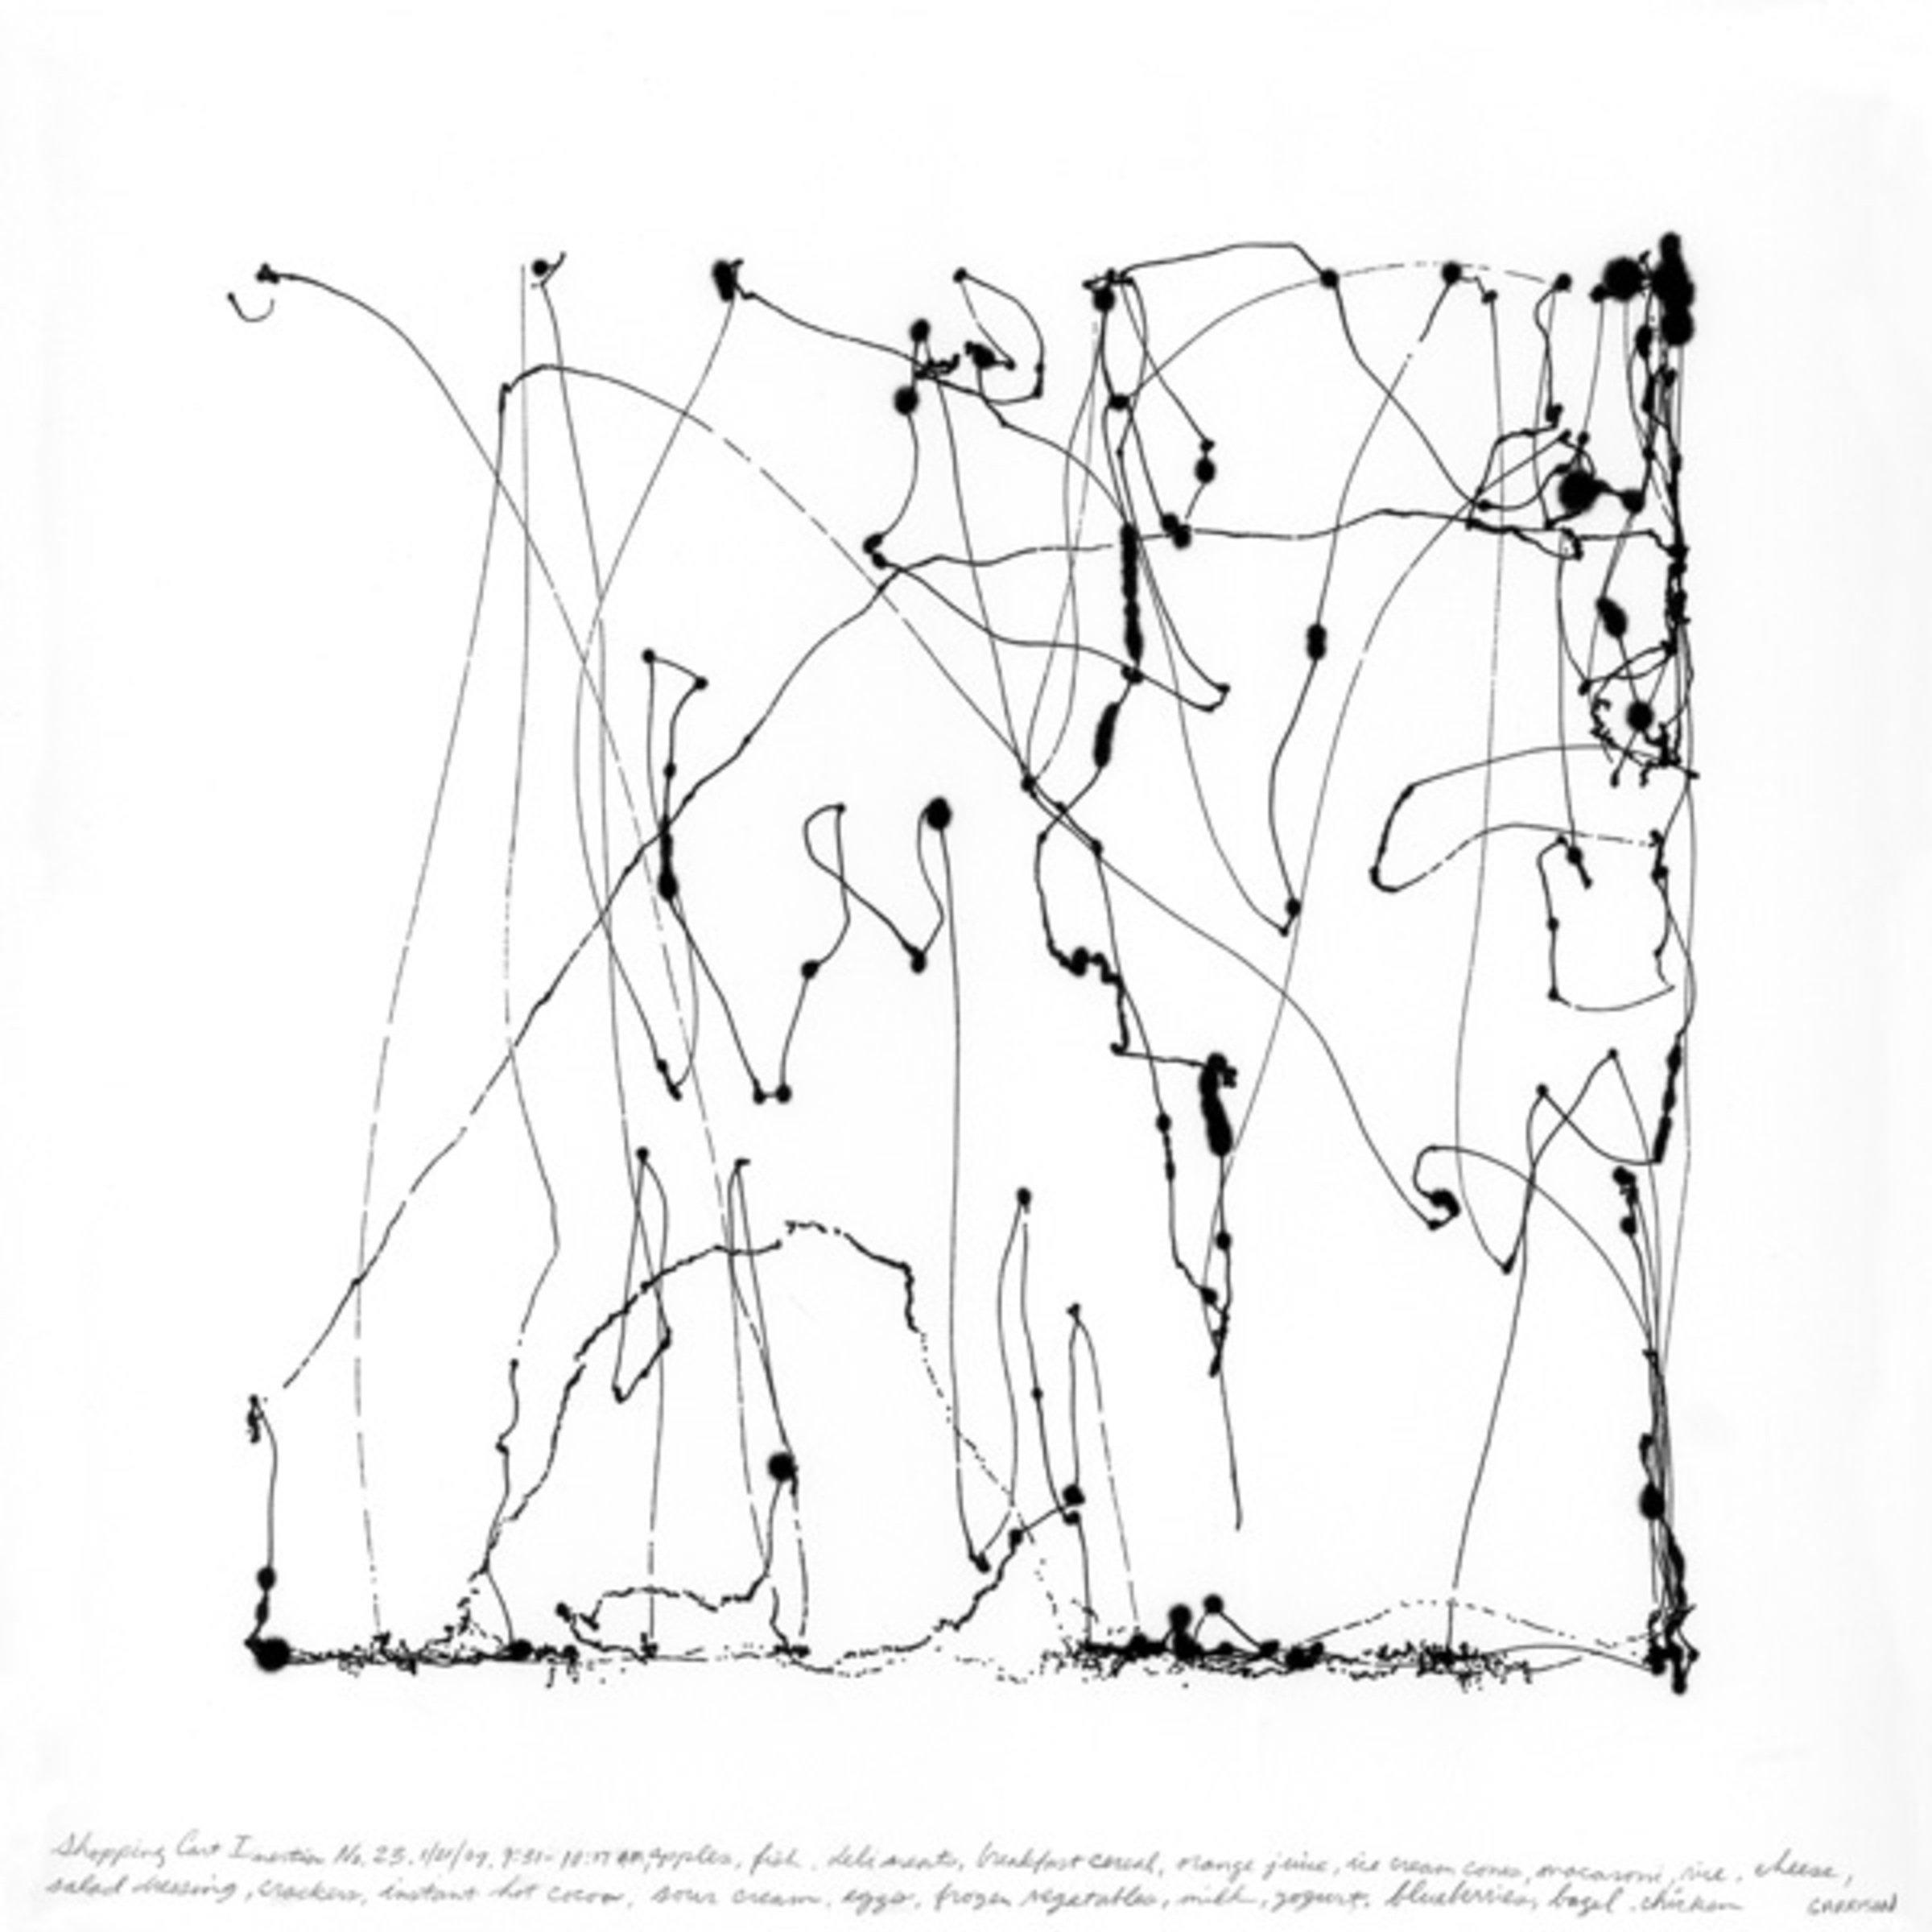 Richard Garrison, Shopping Cart Inertia No. 23, 2007